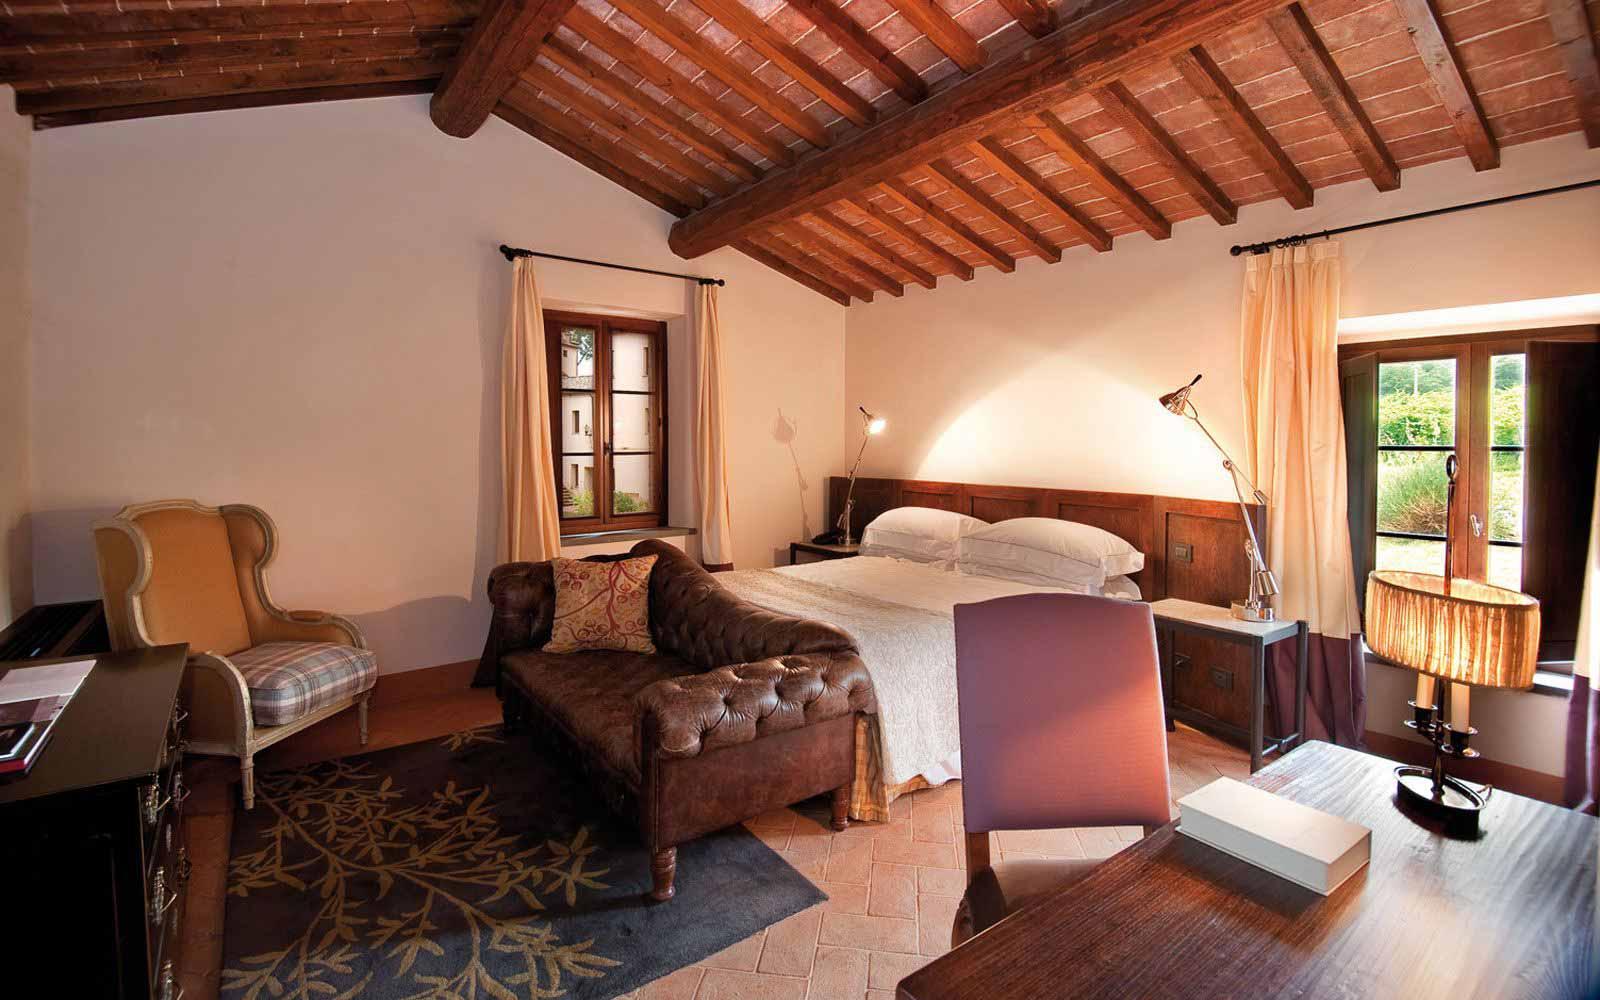 Prestige room at Castel Monastero Tuscan Resort & Spa